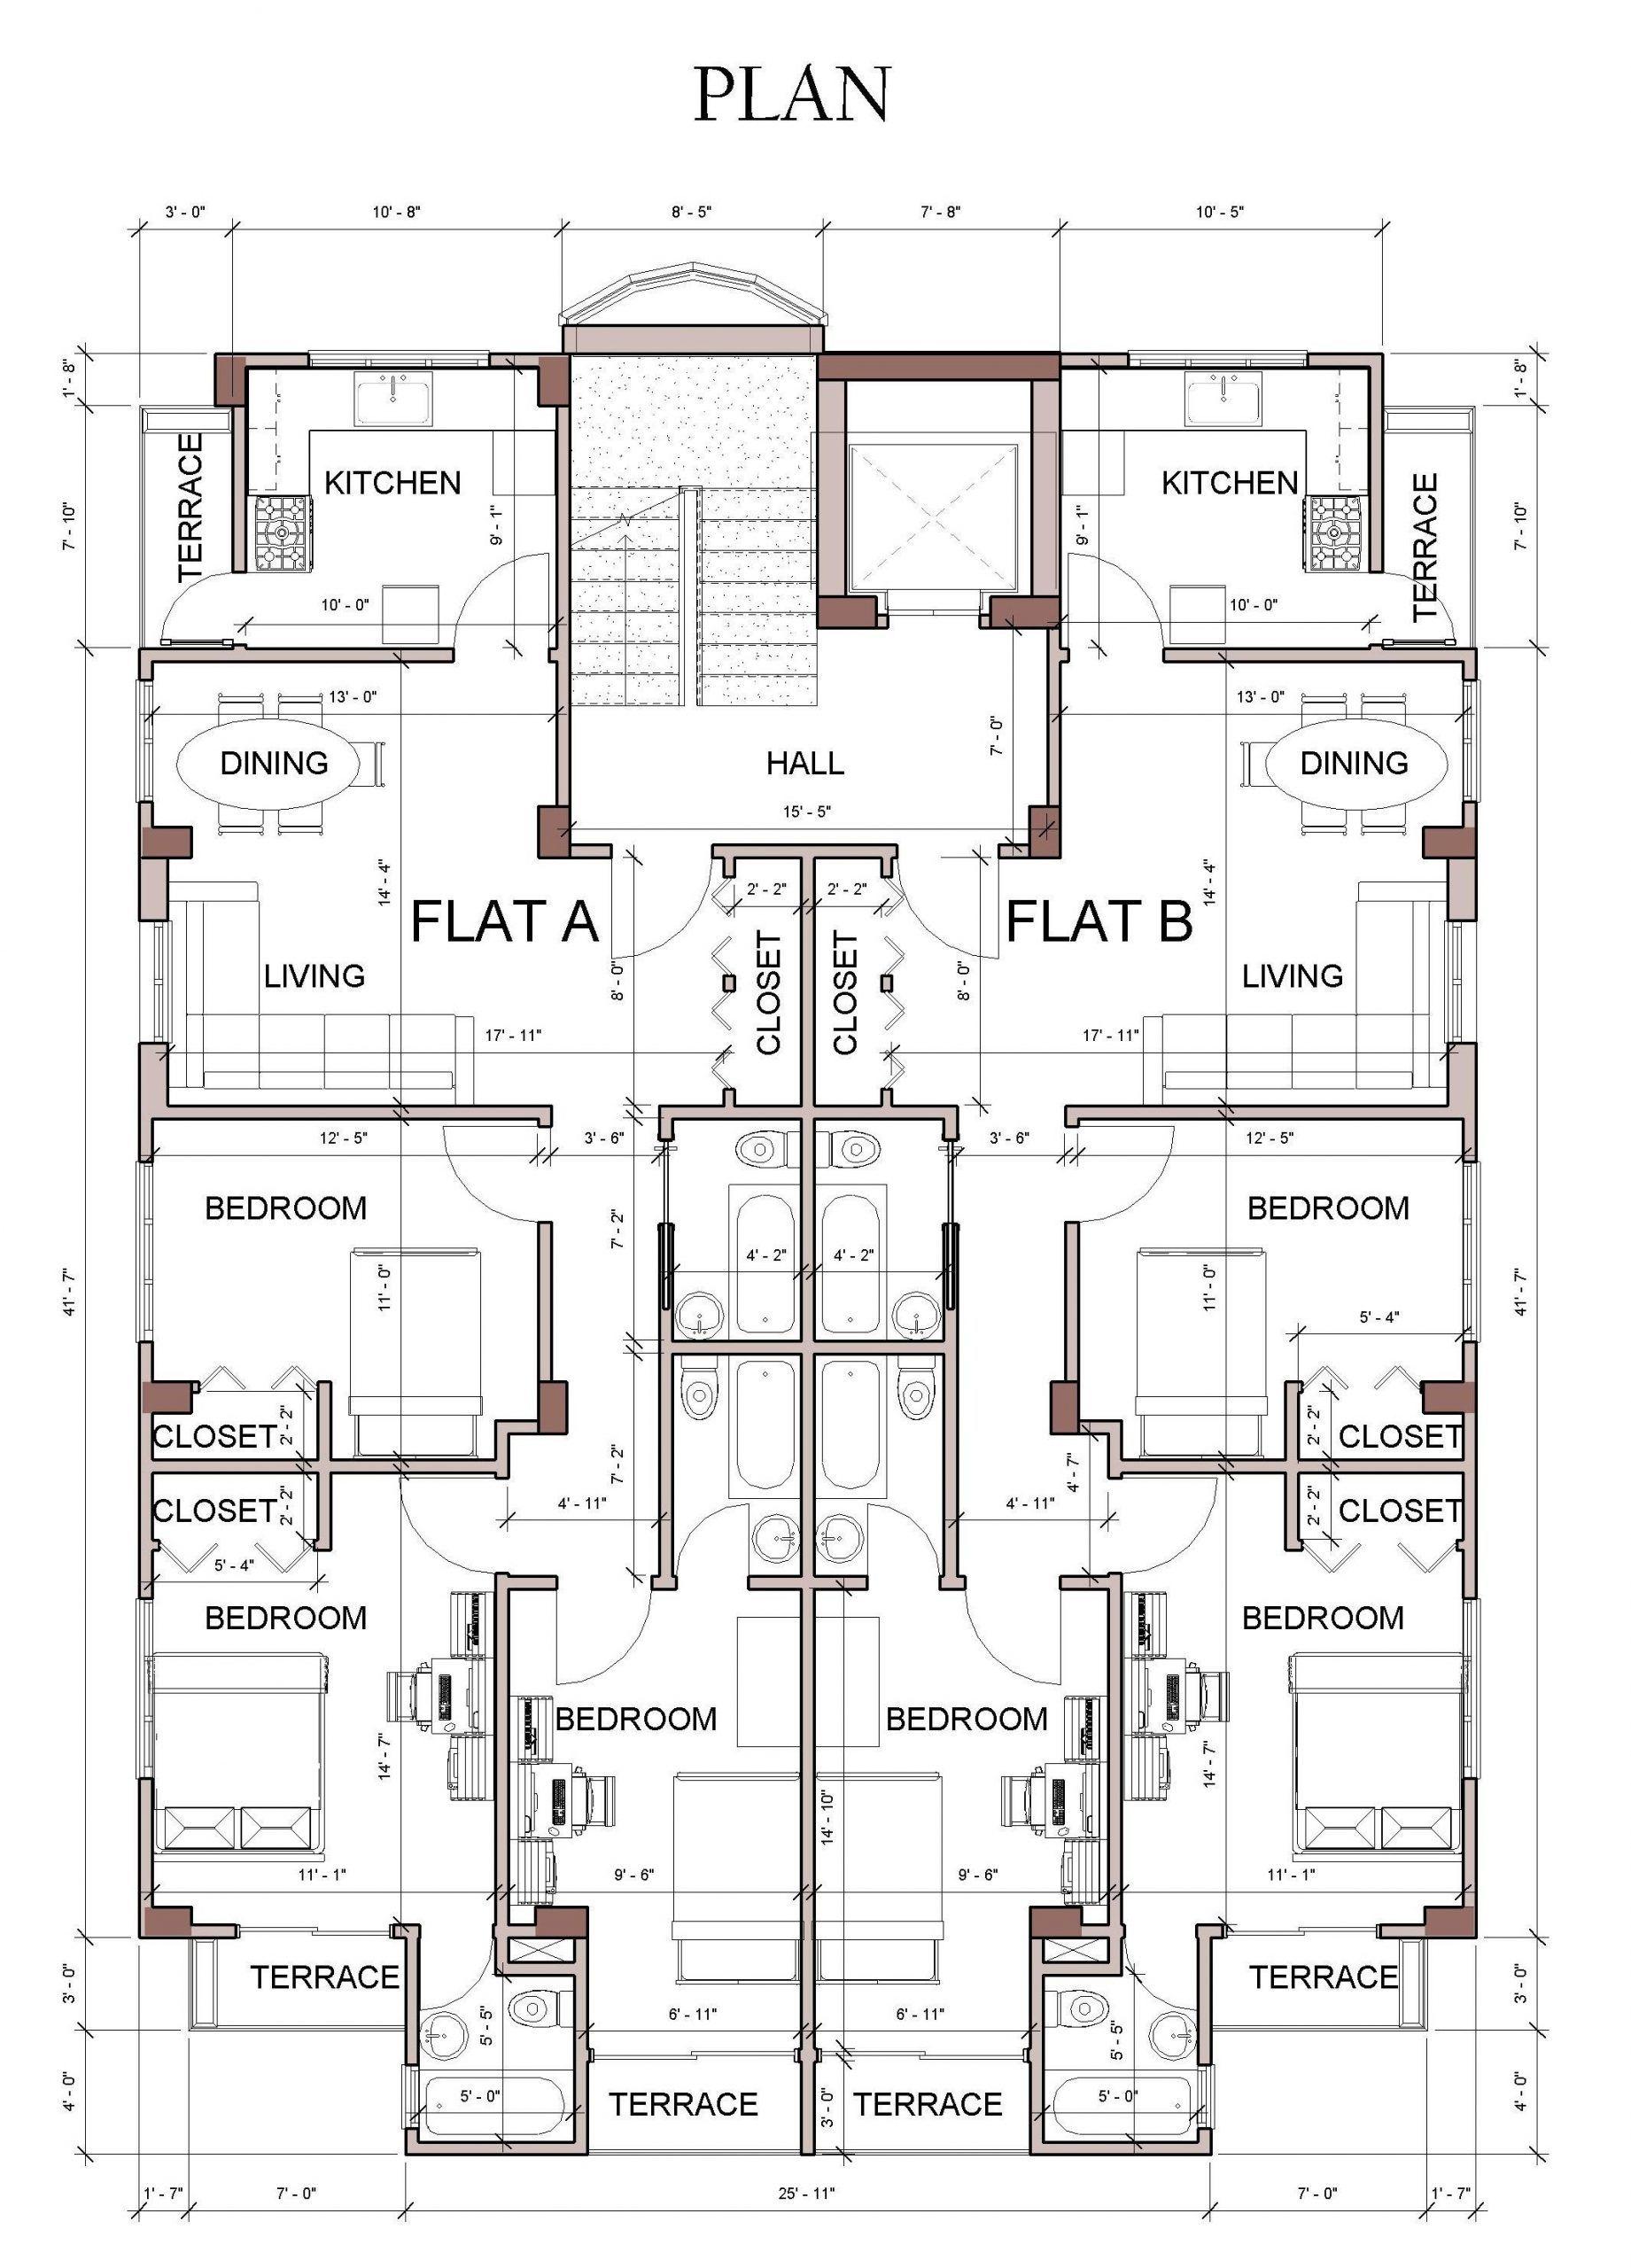 Autocad Floor Plan Samples 2020 Floor Plan Design Residential Architecture Plan Hotel Floor Plan